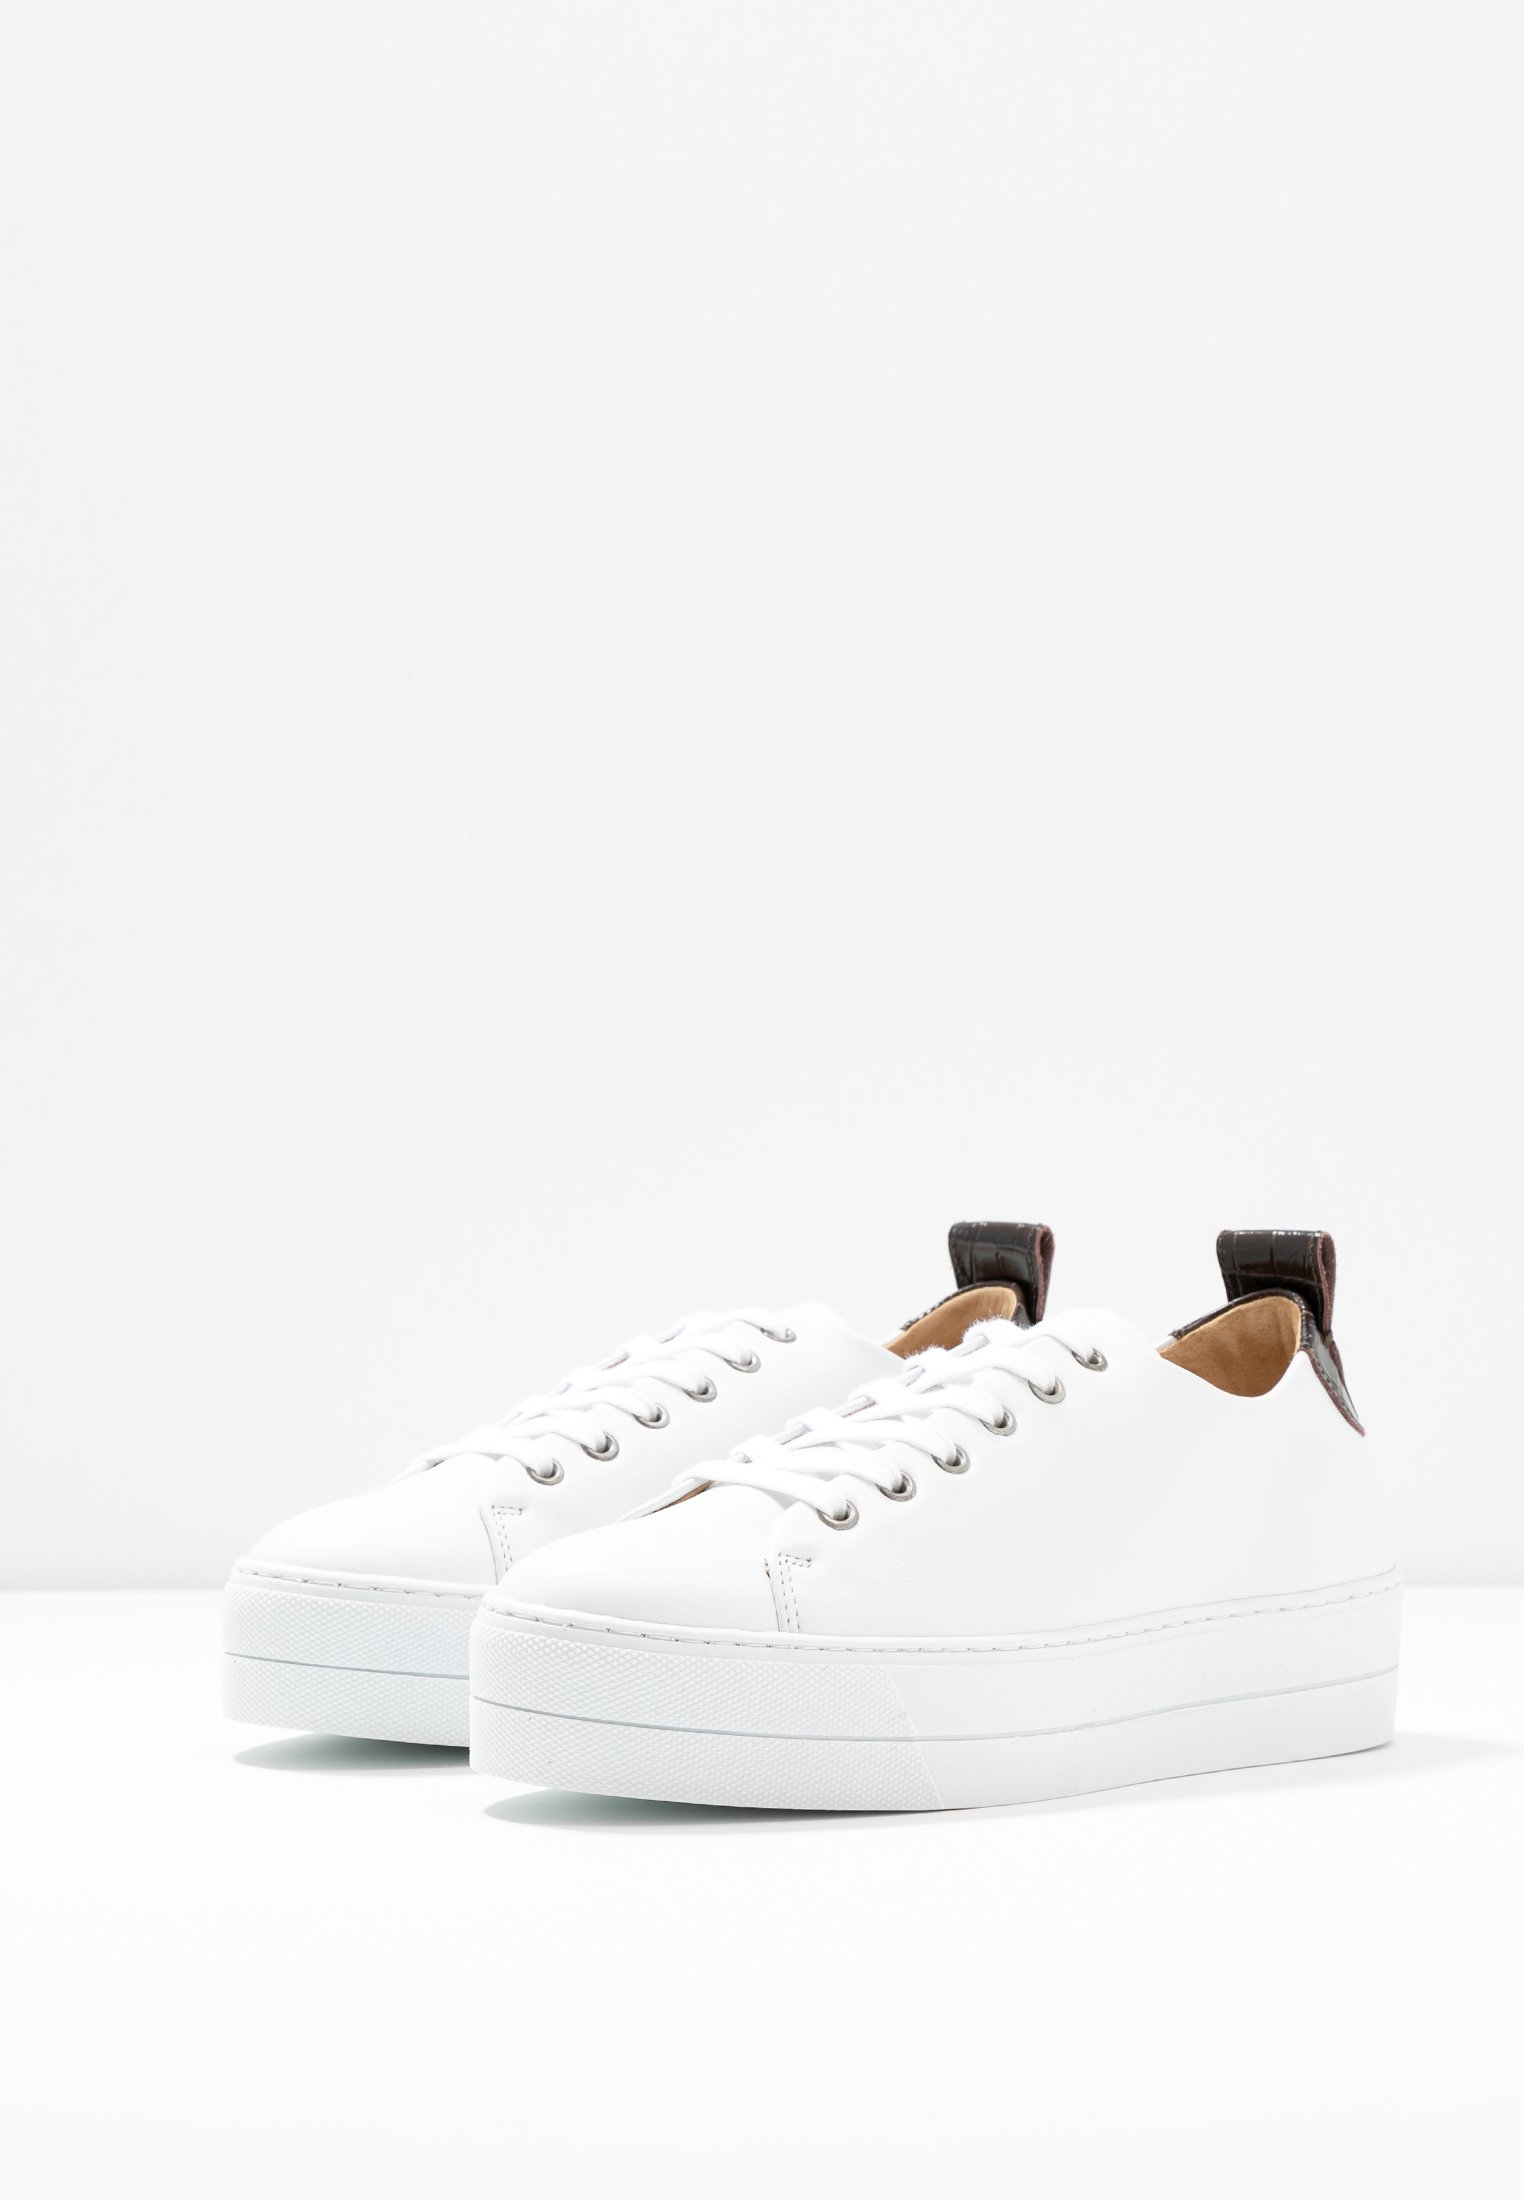 Samsøe Samsøe BURMA 9638 - Sneaker low - white/dark brown - Black Friday